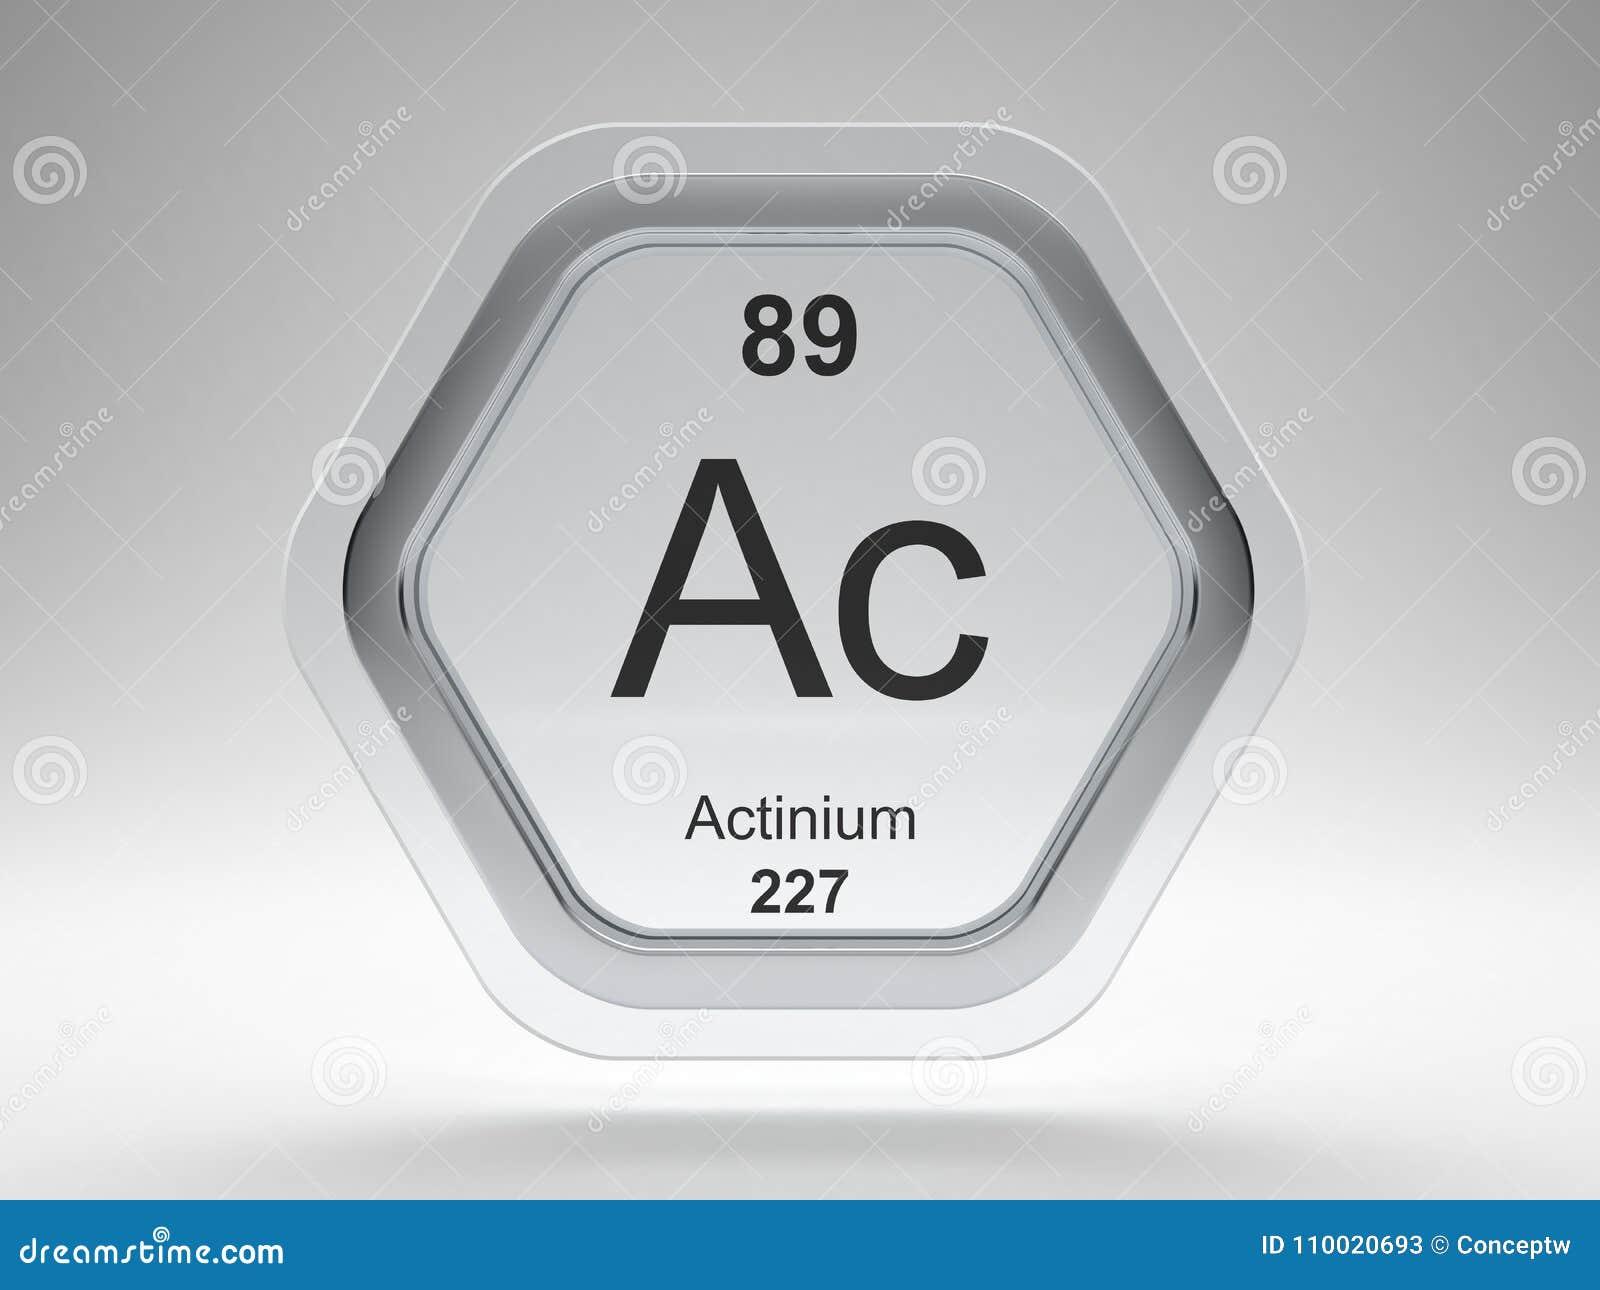 Actinium Symbol Hexagon Frame Stock Illustration Illustration Of